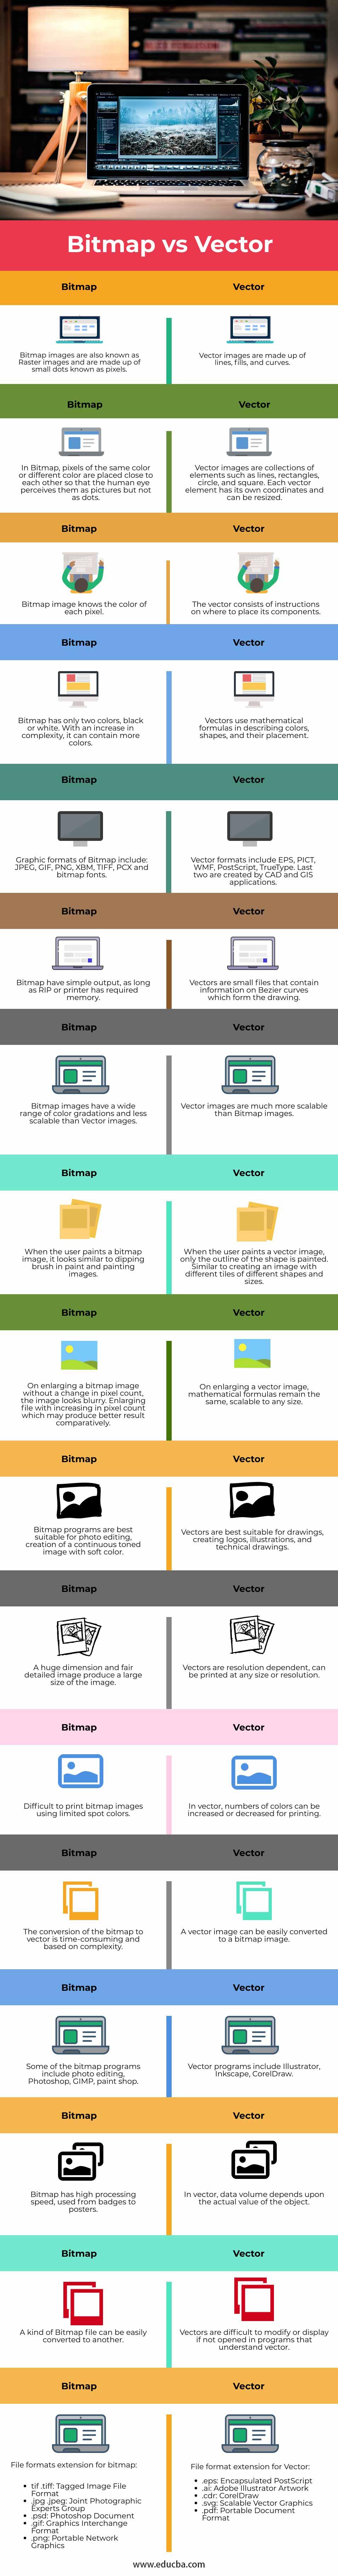 Bitmap-vs-Vector-info